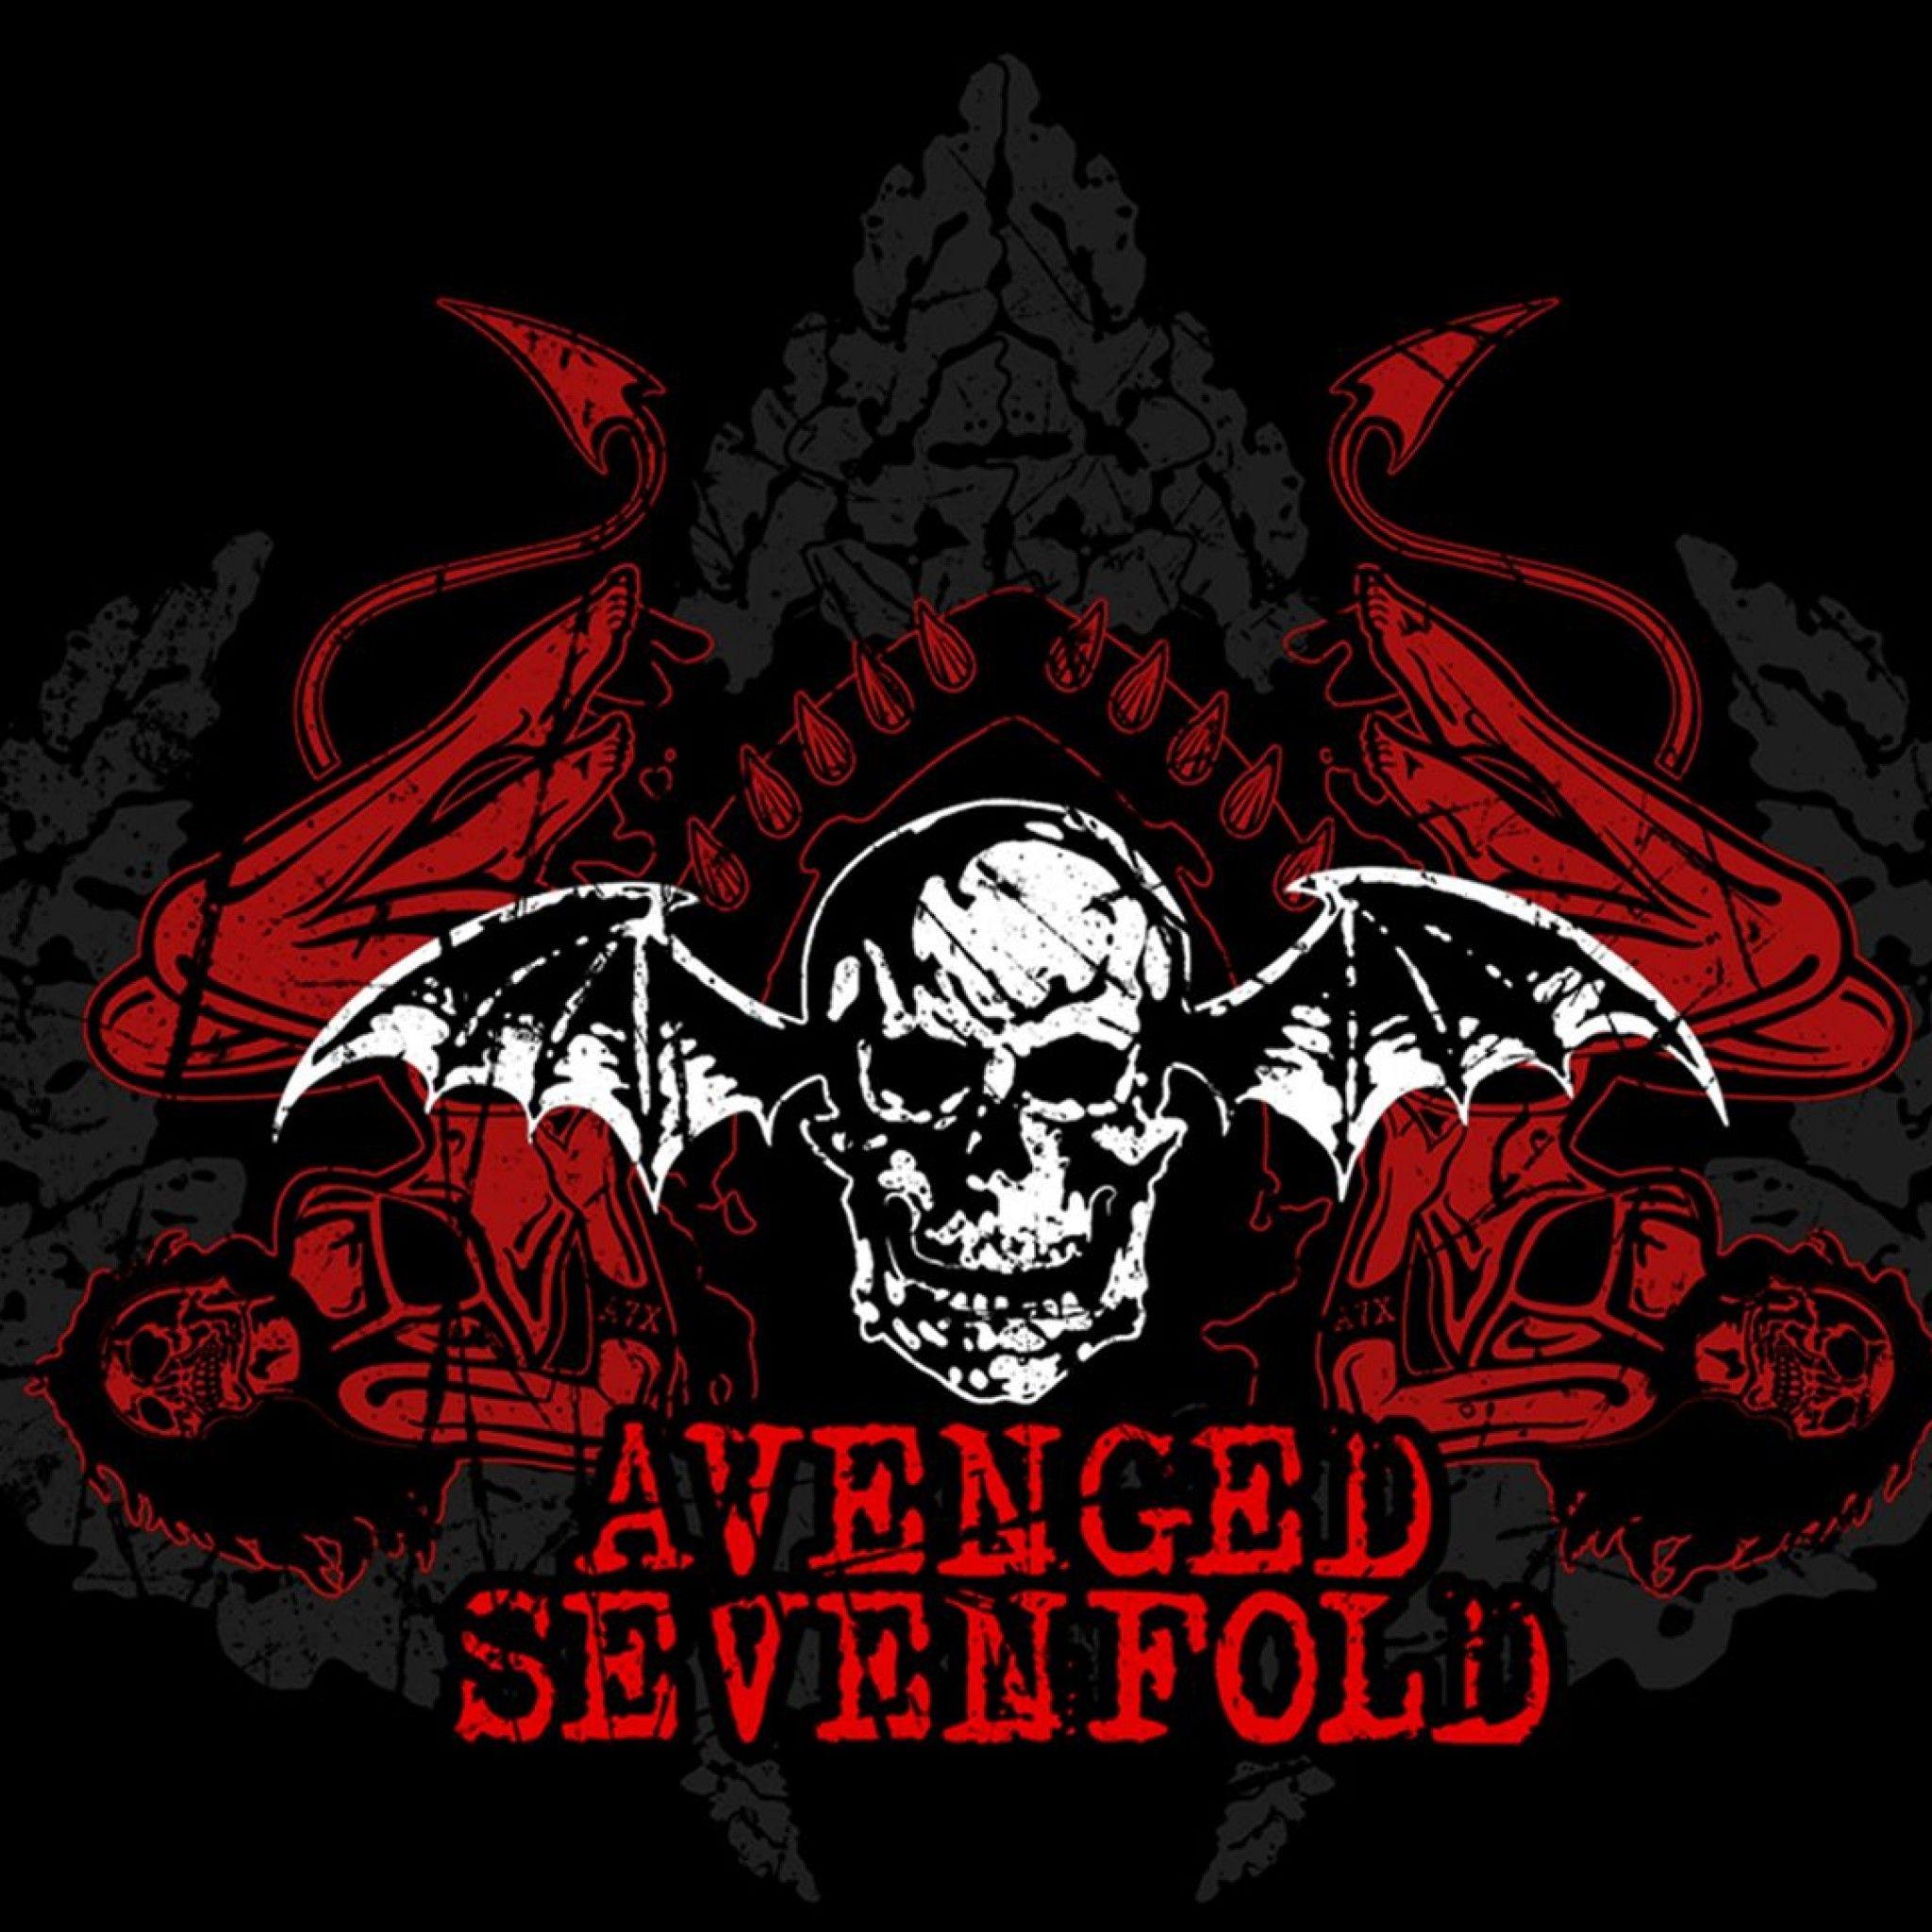 Download free victim avenged sevenfold hd wallpaper get best hd download voltagebd Gallery